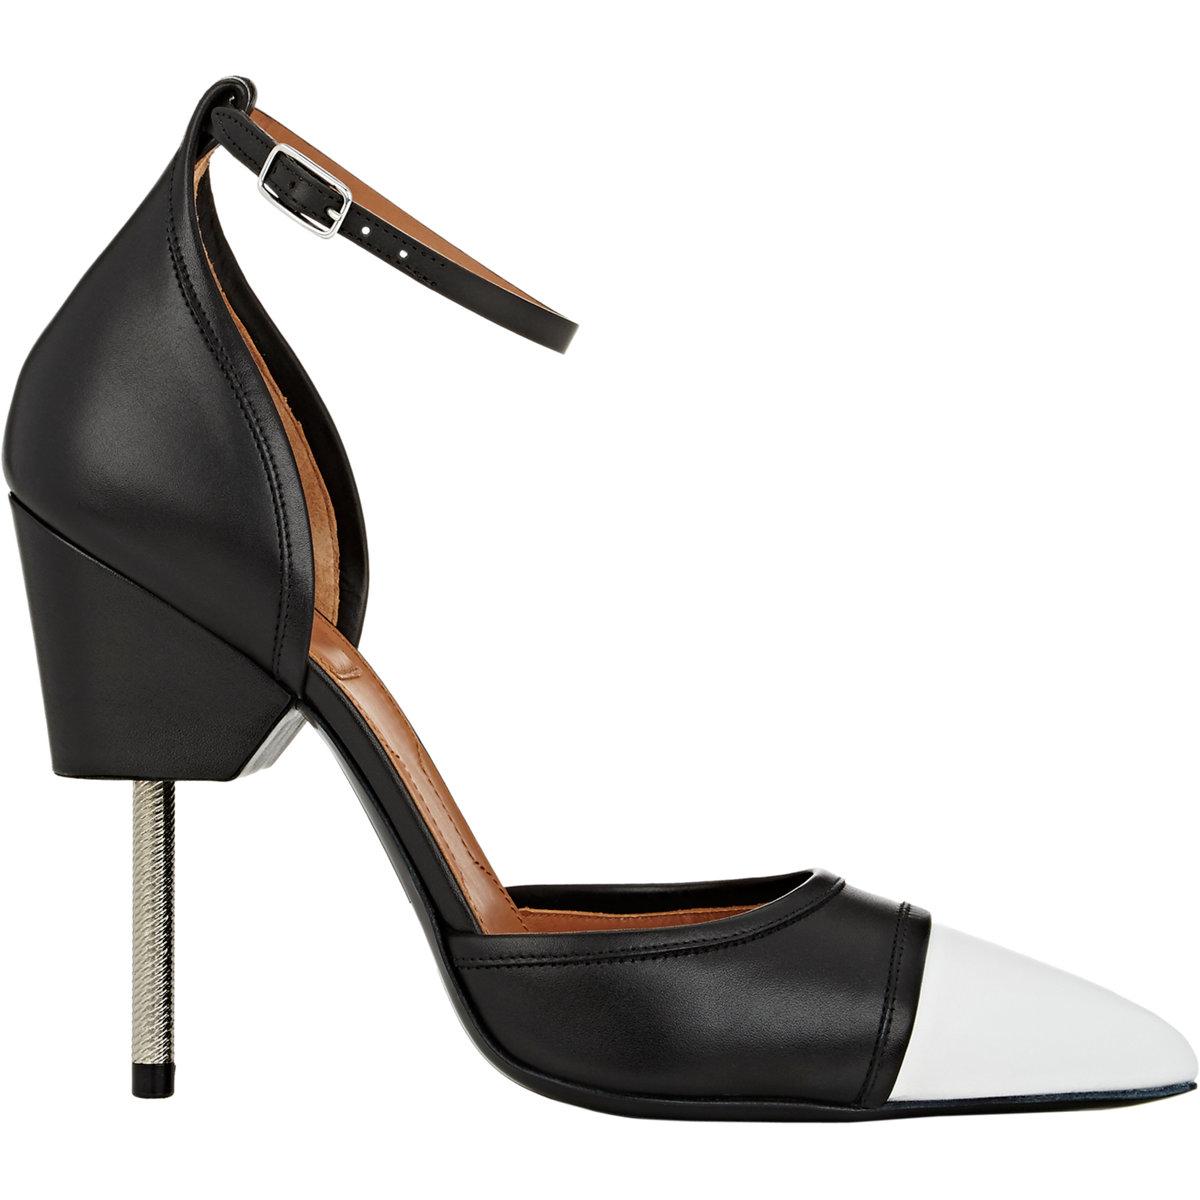 2efe30b51b6 Lyst - Givenchy Screw-heel D orsay Pumps in Black